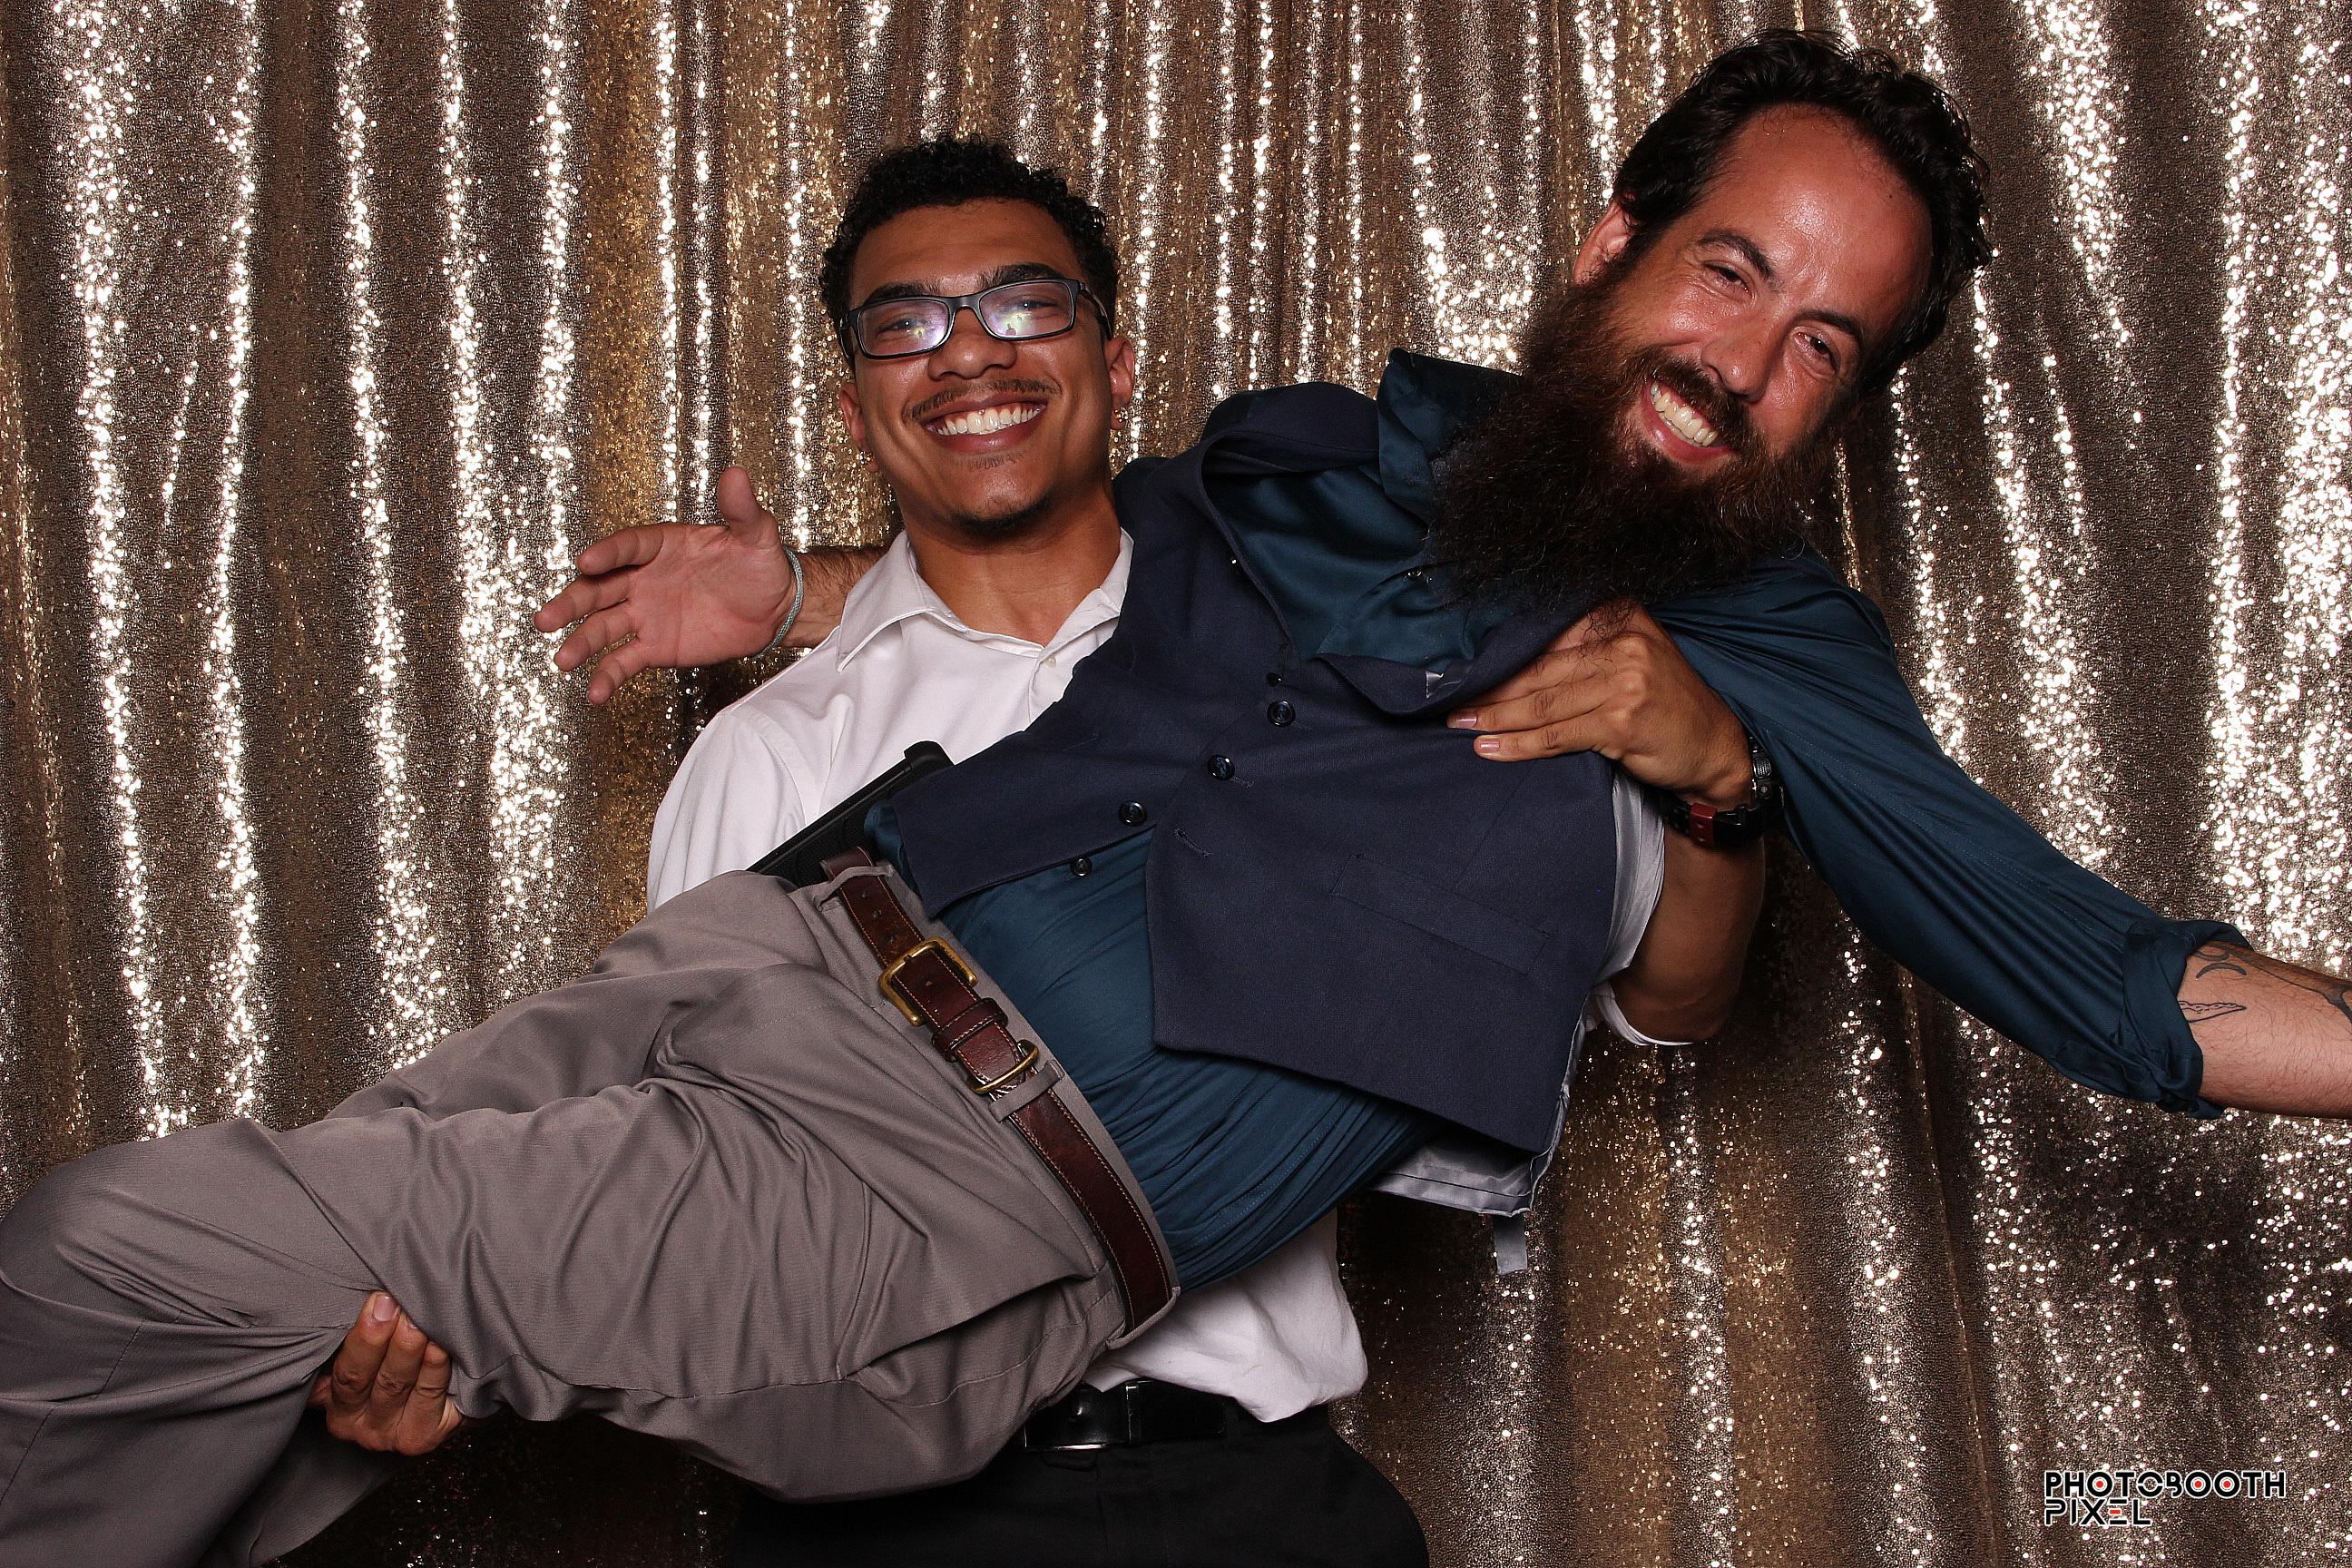 wedding photo booth jacksonville fl